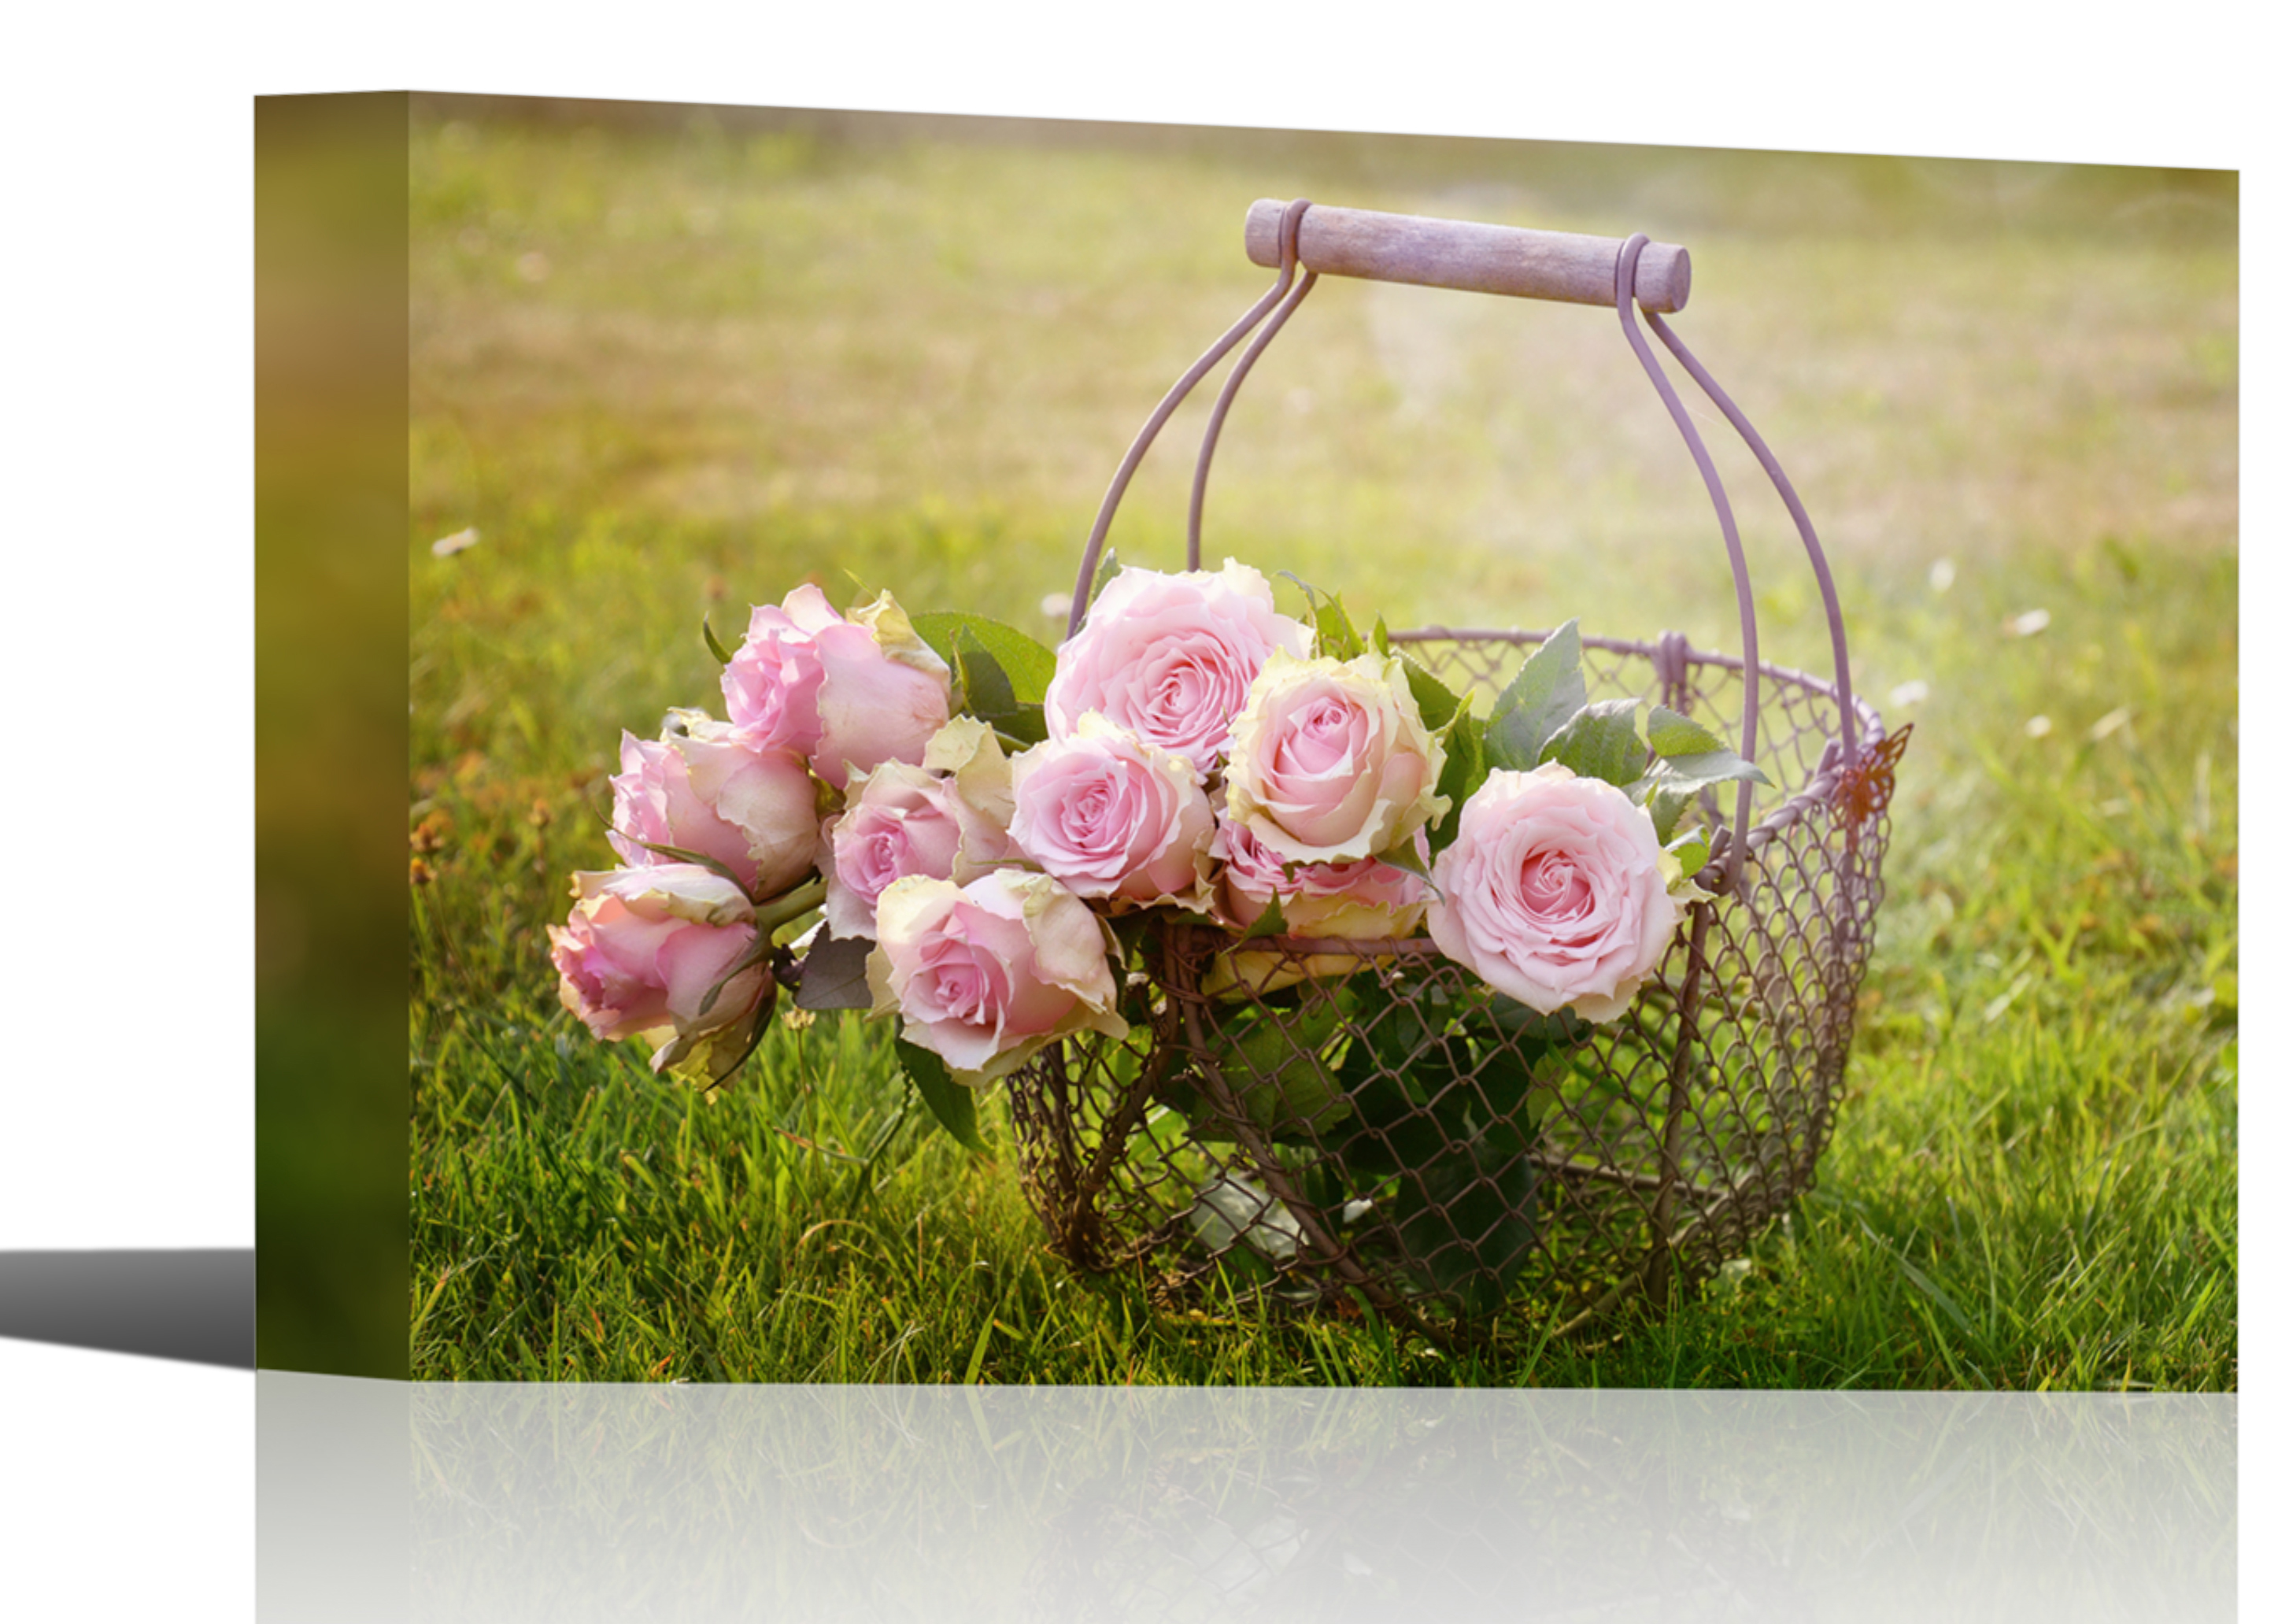 Rose Blossoms Flower Bouquet Art Print Wall Decor Image Canvas ...